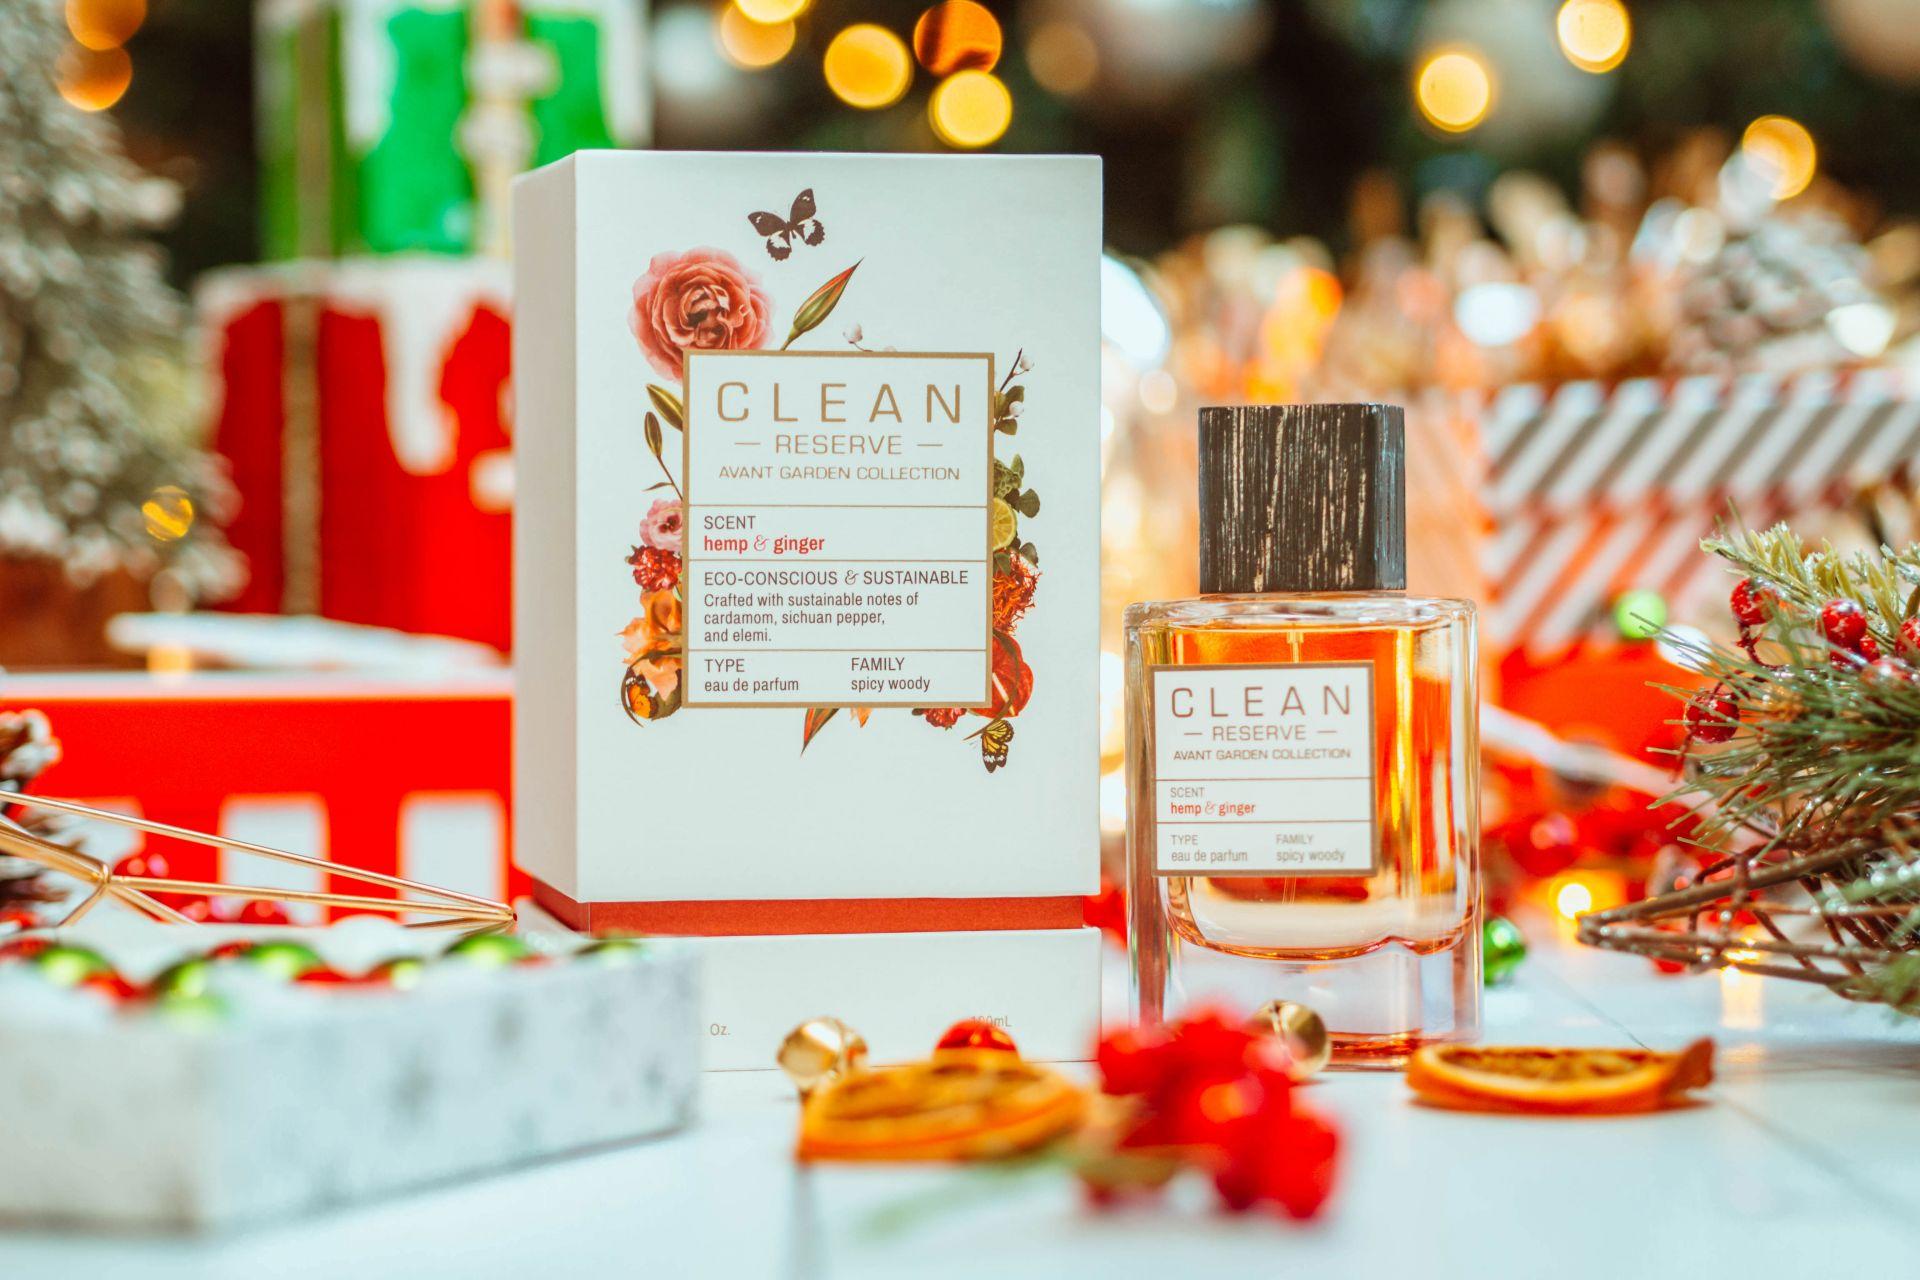 Clean Reserve Avant Garden Hemp & Ginger Eau de Parfum